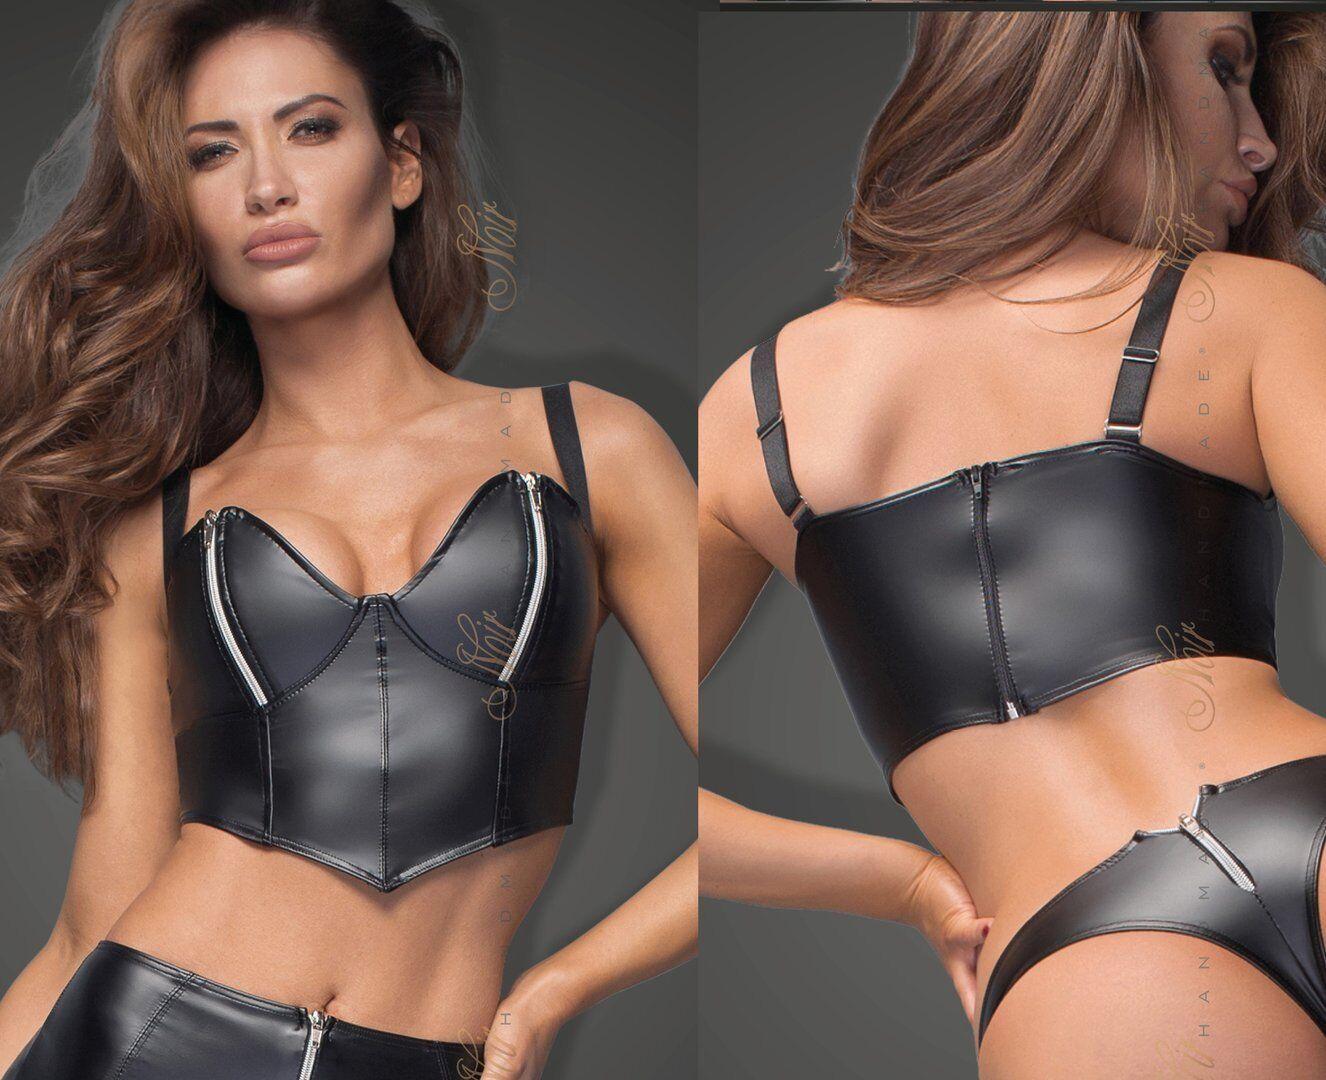 schwarz HANDMADE POWERWETLOOK TOP bustier gogo clubwear schwarz wetlook lack